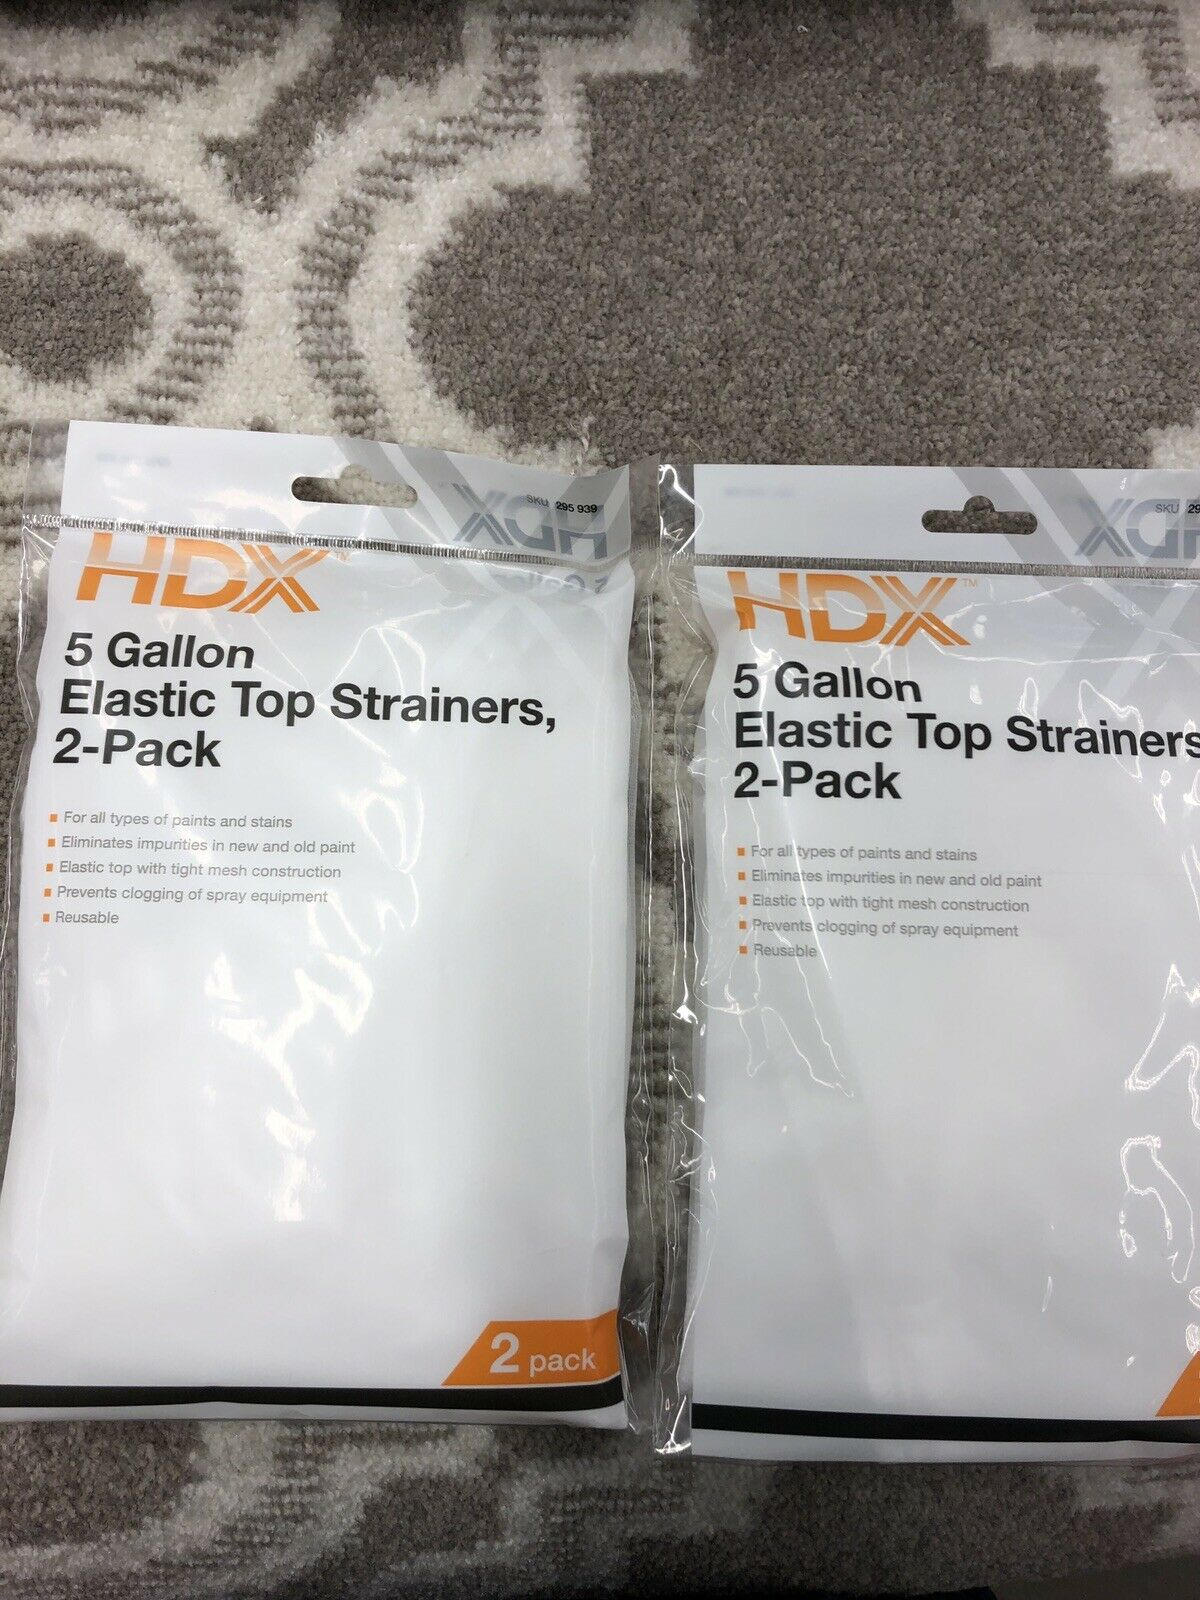 Hdx 5 Gallon Elastic Top Strainers 2 Pack Set Of 2 Ebay